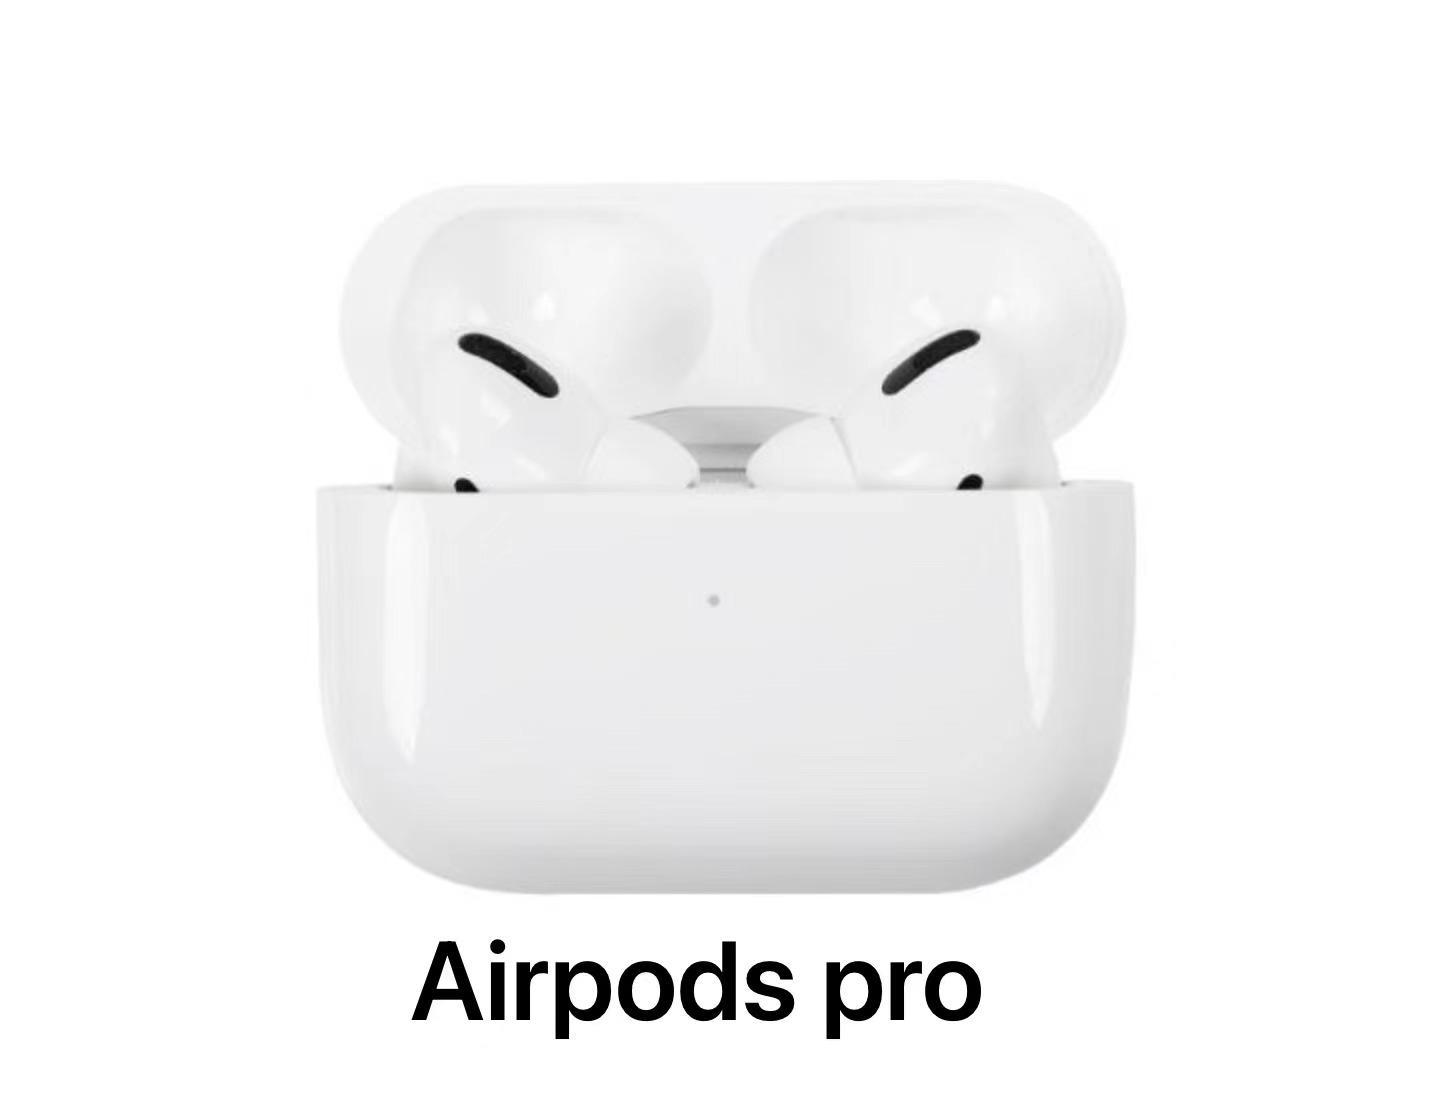 Airpods Pro Ruído Cancelar ANC TWS Earphones GPS Renomear Pro Pop Up Janela Bluetooth Headphone Paring Caixa de carregamento sem fio